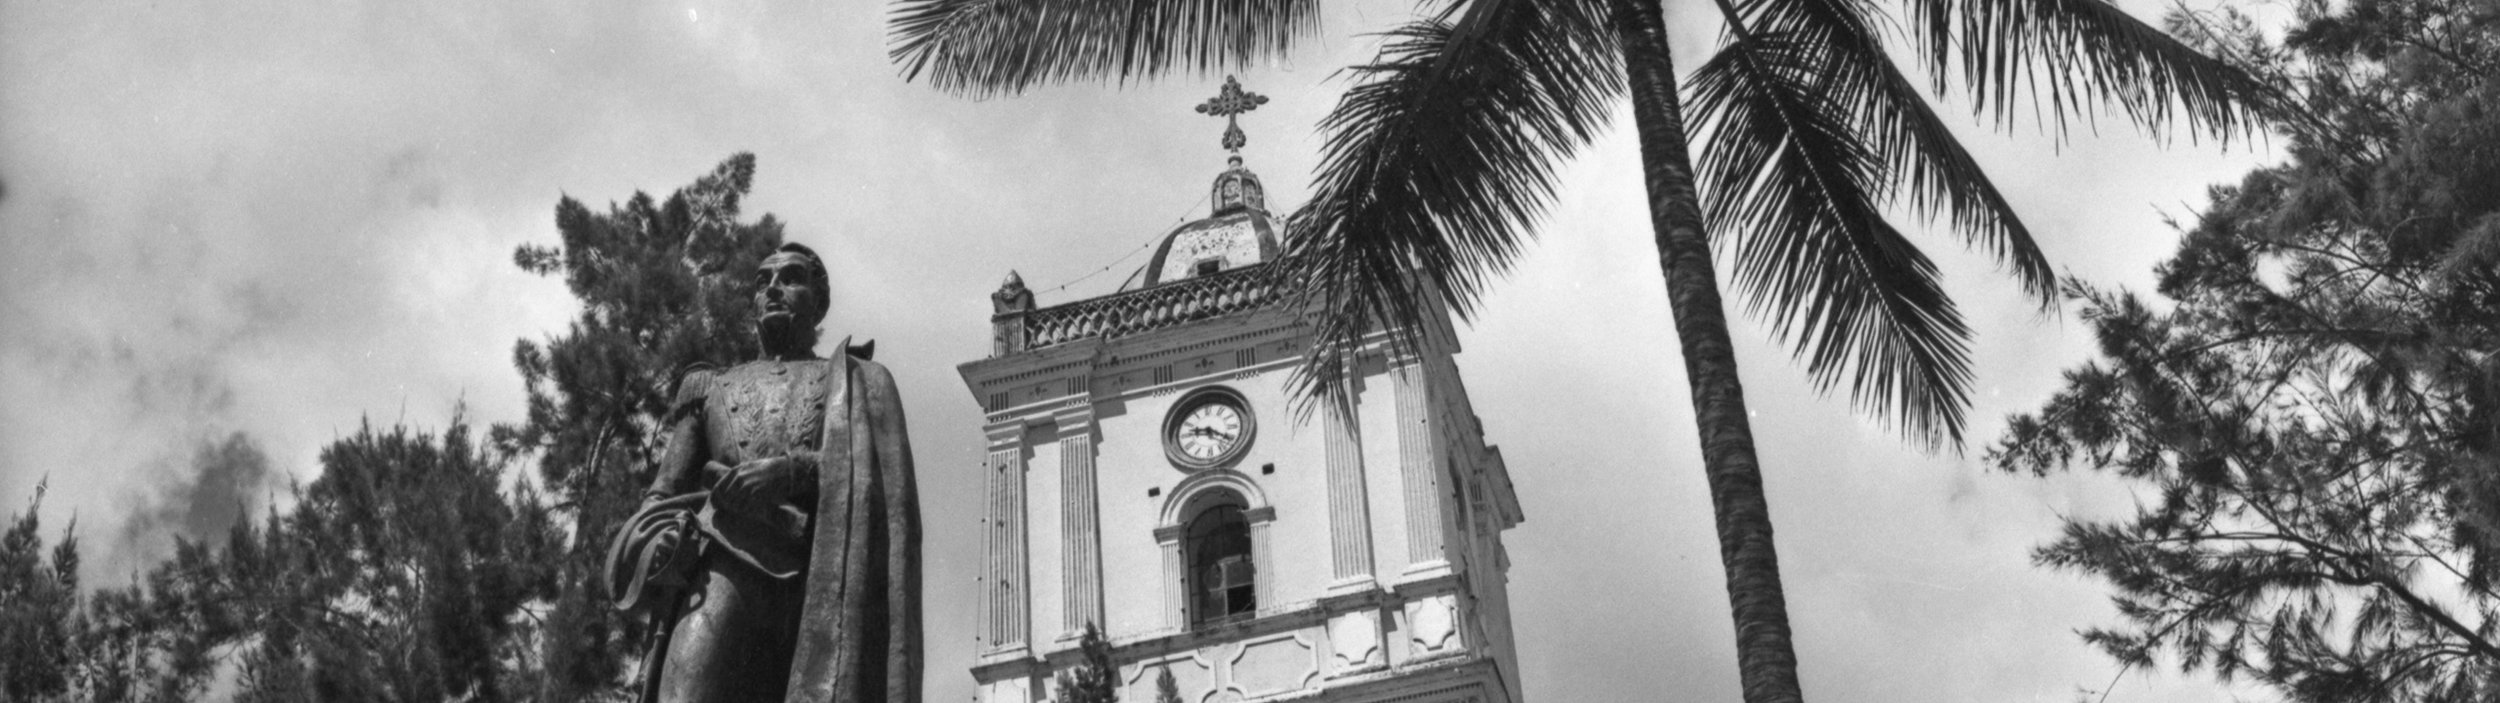 La Plaza Bolívar by Hector Sandoval ~c. 1970